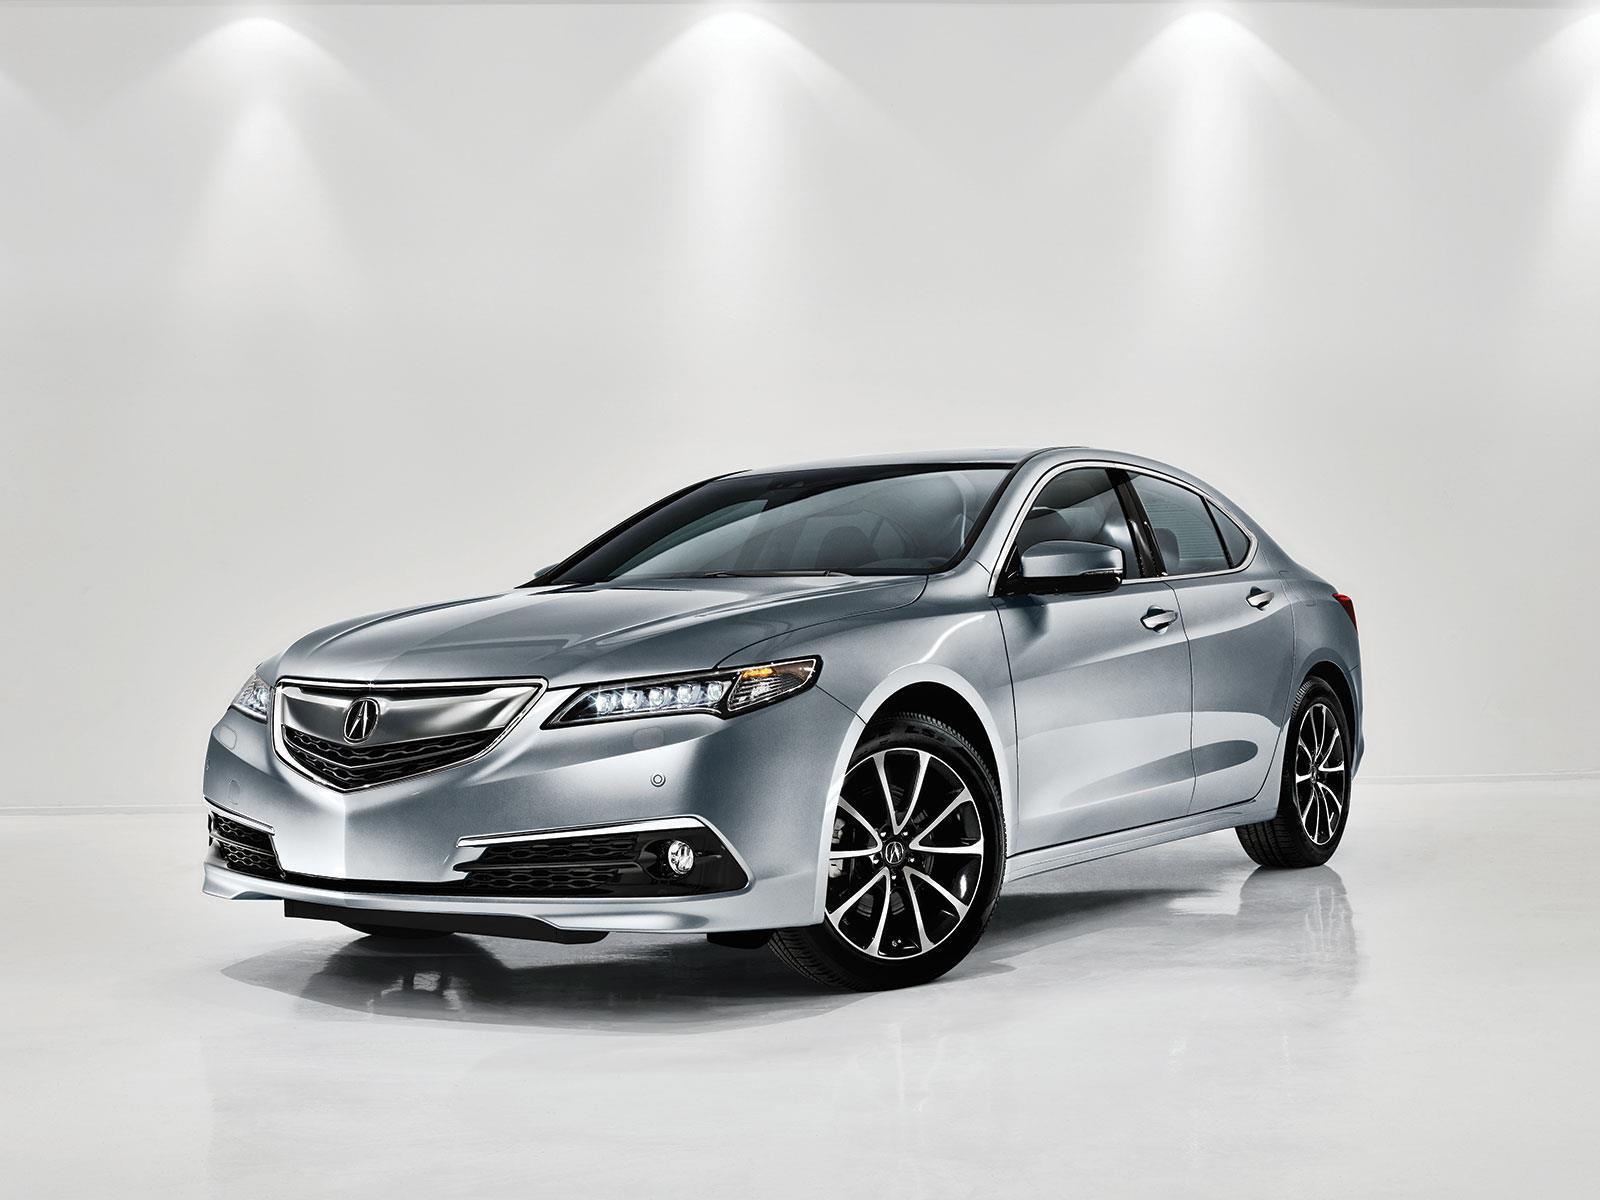 2015 Acura Tlx Tech >> Acura TLX 2015 llega a México desde $515,000 pesos - Autocosmos.com